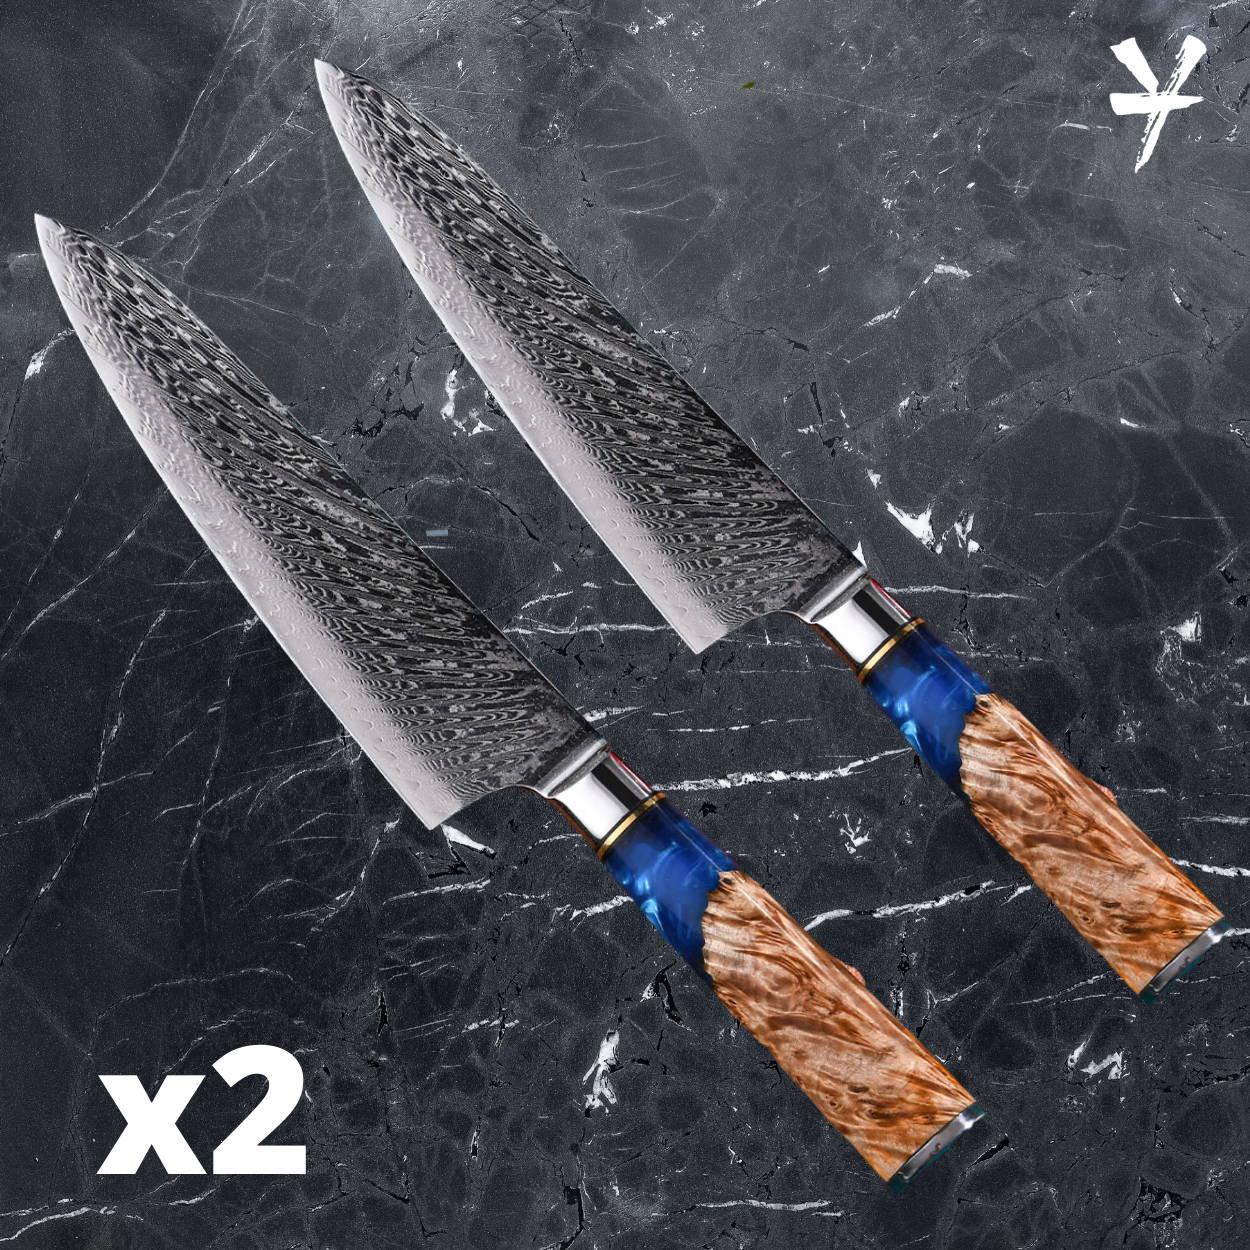 Damascus steel knife set, japanese chef knife, best japanese kitchen knife, damascus chef knife